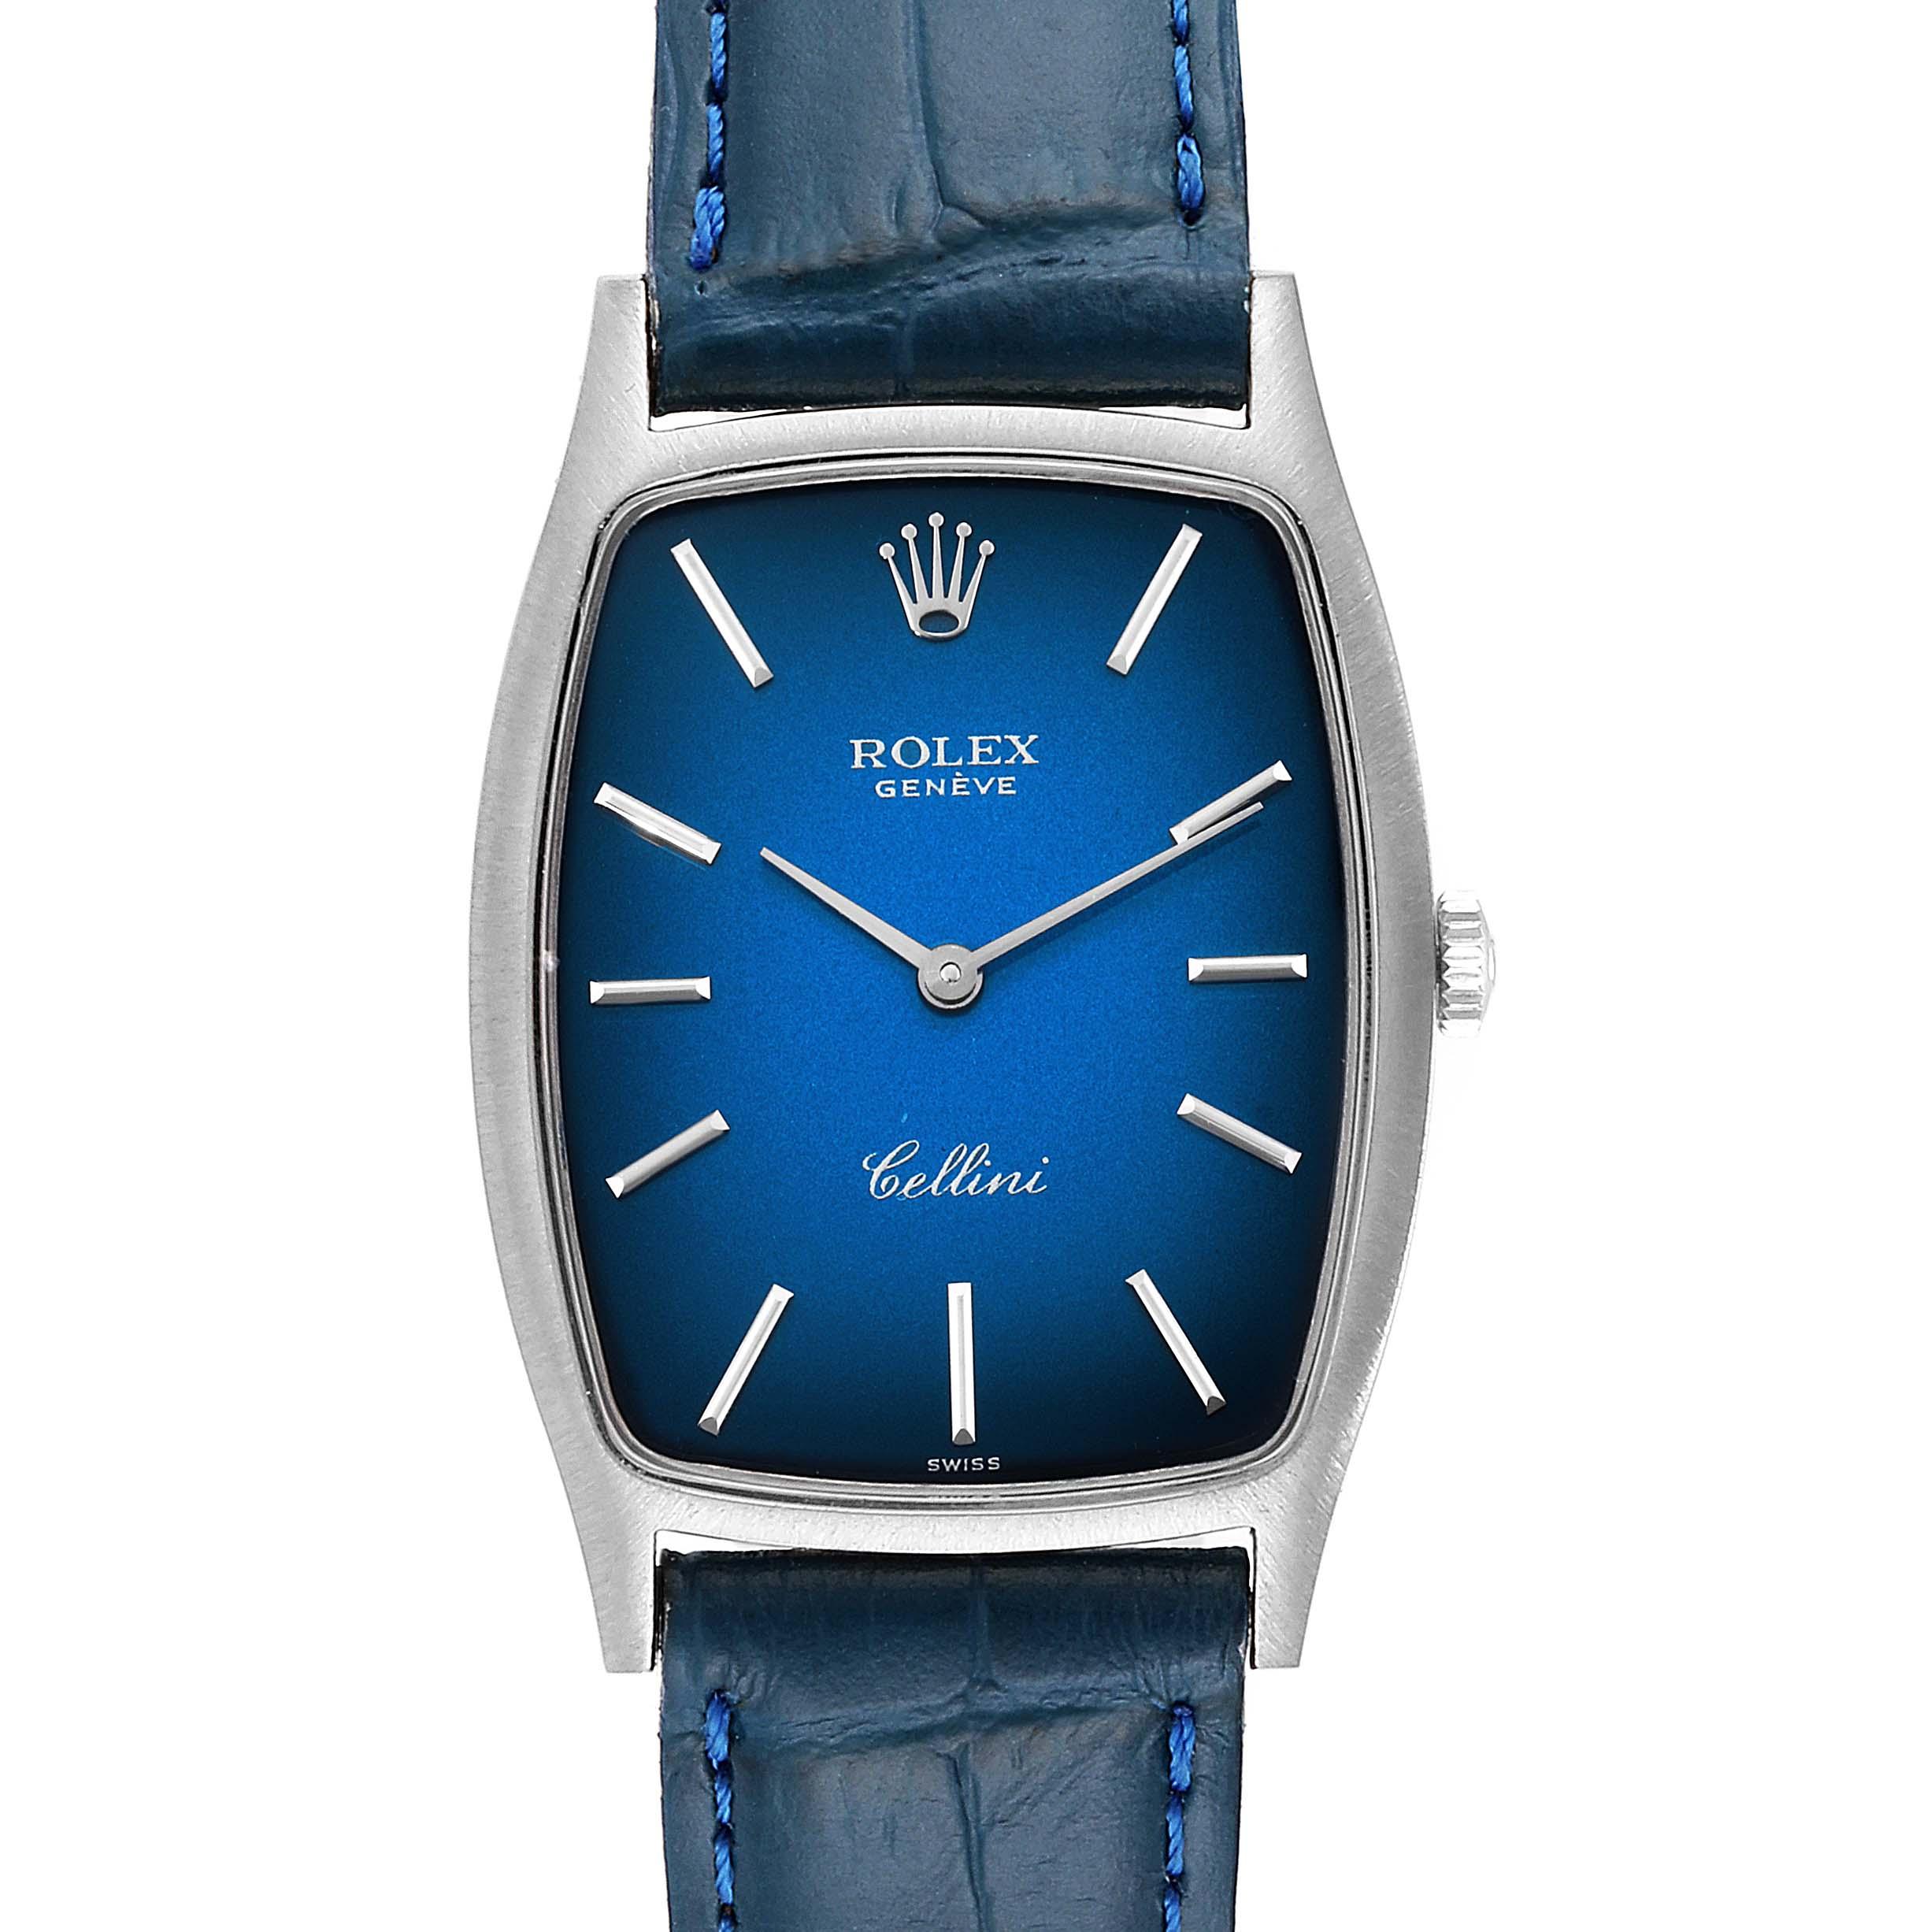 Photo of Rolex Cellini White Gold Blue Vignette Dial Vintage Ladies Watch 3807